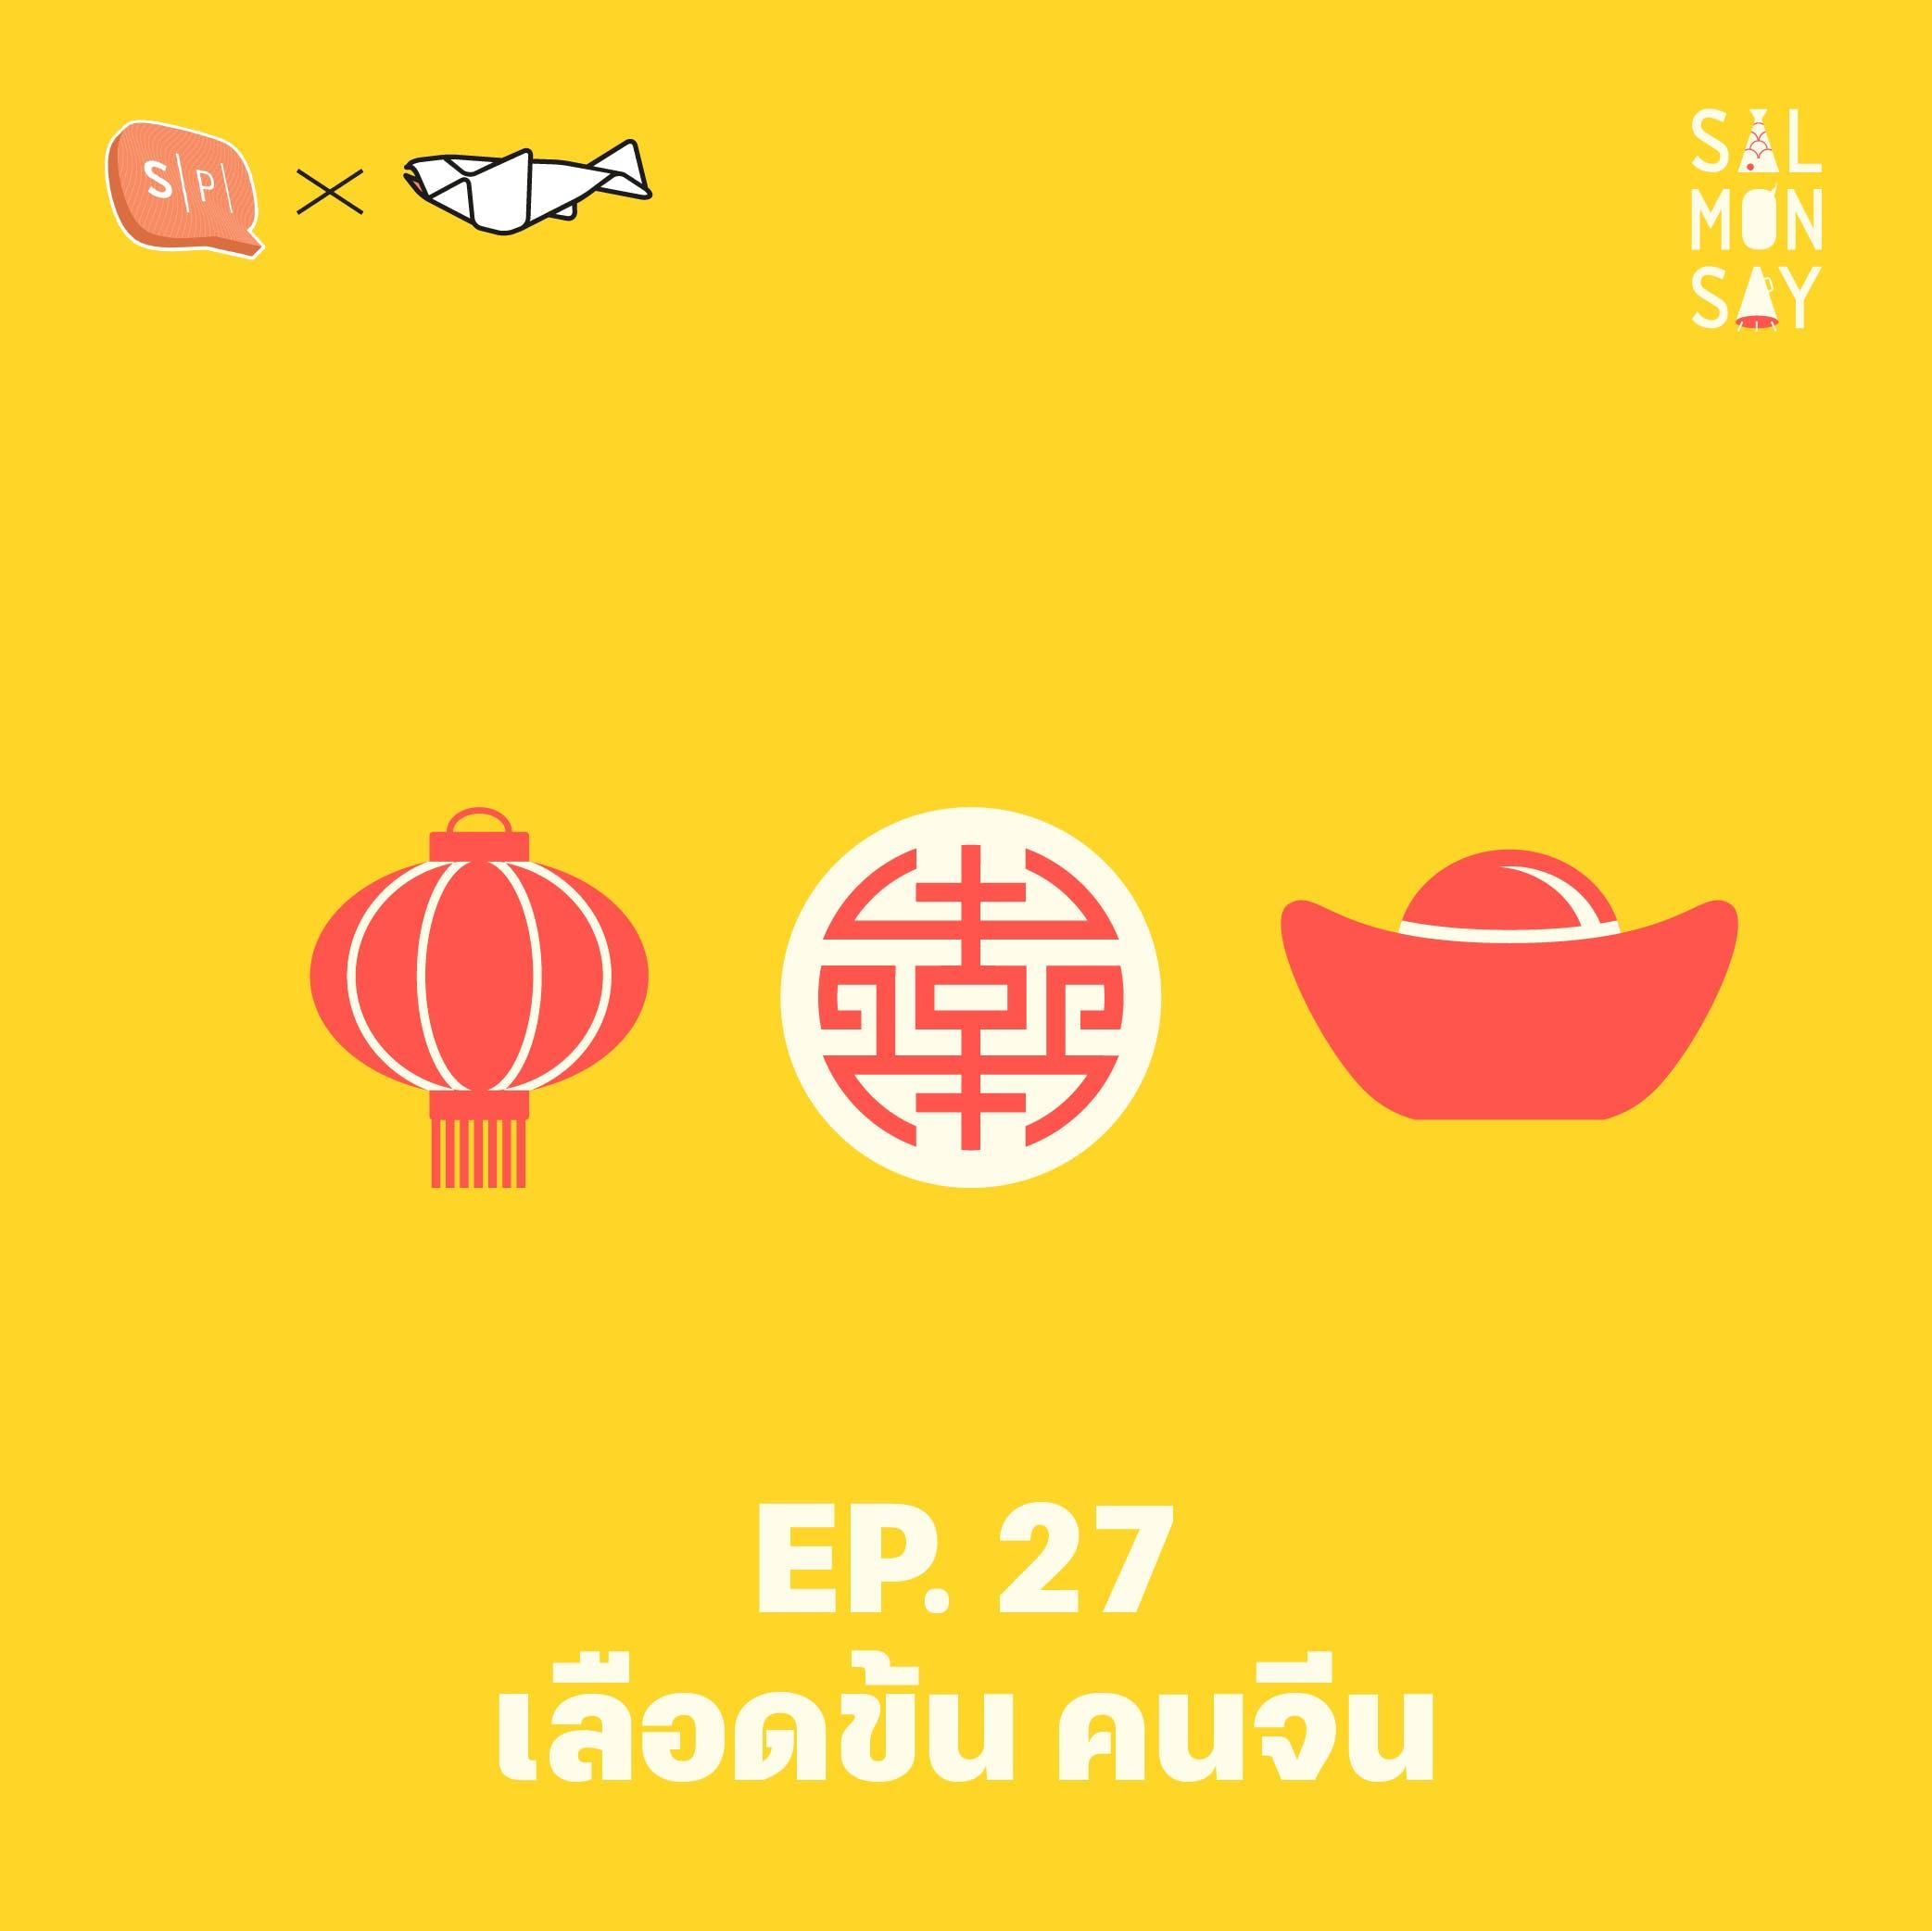 Spin-off series: FAMILY COMES FIRST ด้วยรักและผุพัง | เลือดข้น คนจีน | Salmonsay EP27